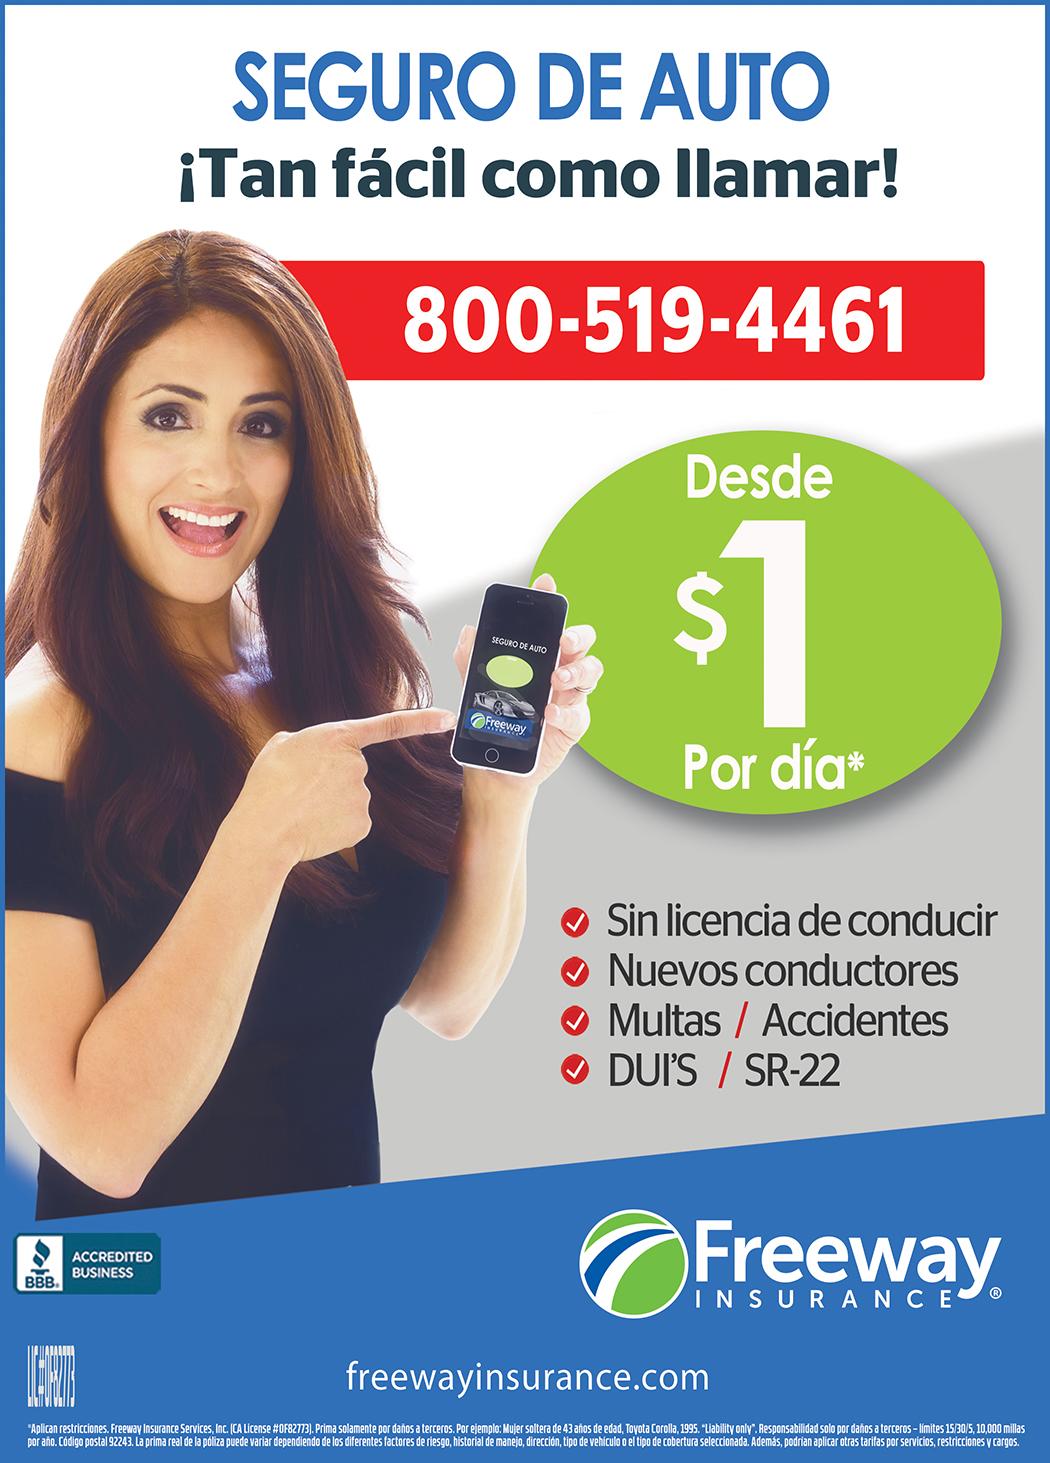 Freeway Insurance 1pag FEBRERO 2019 copy.jpg